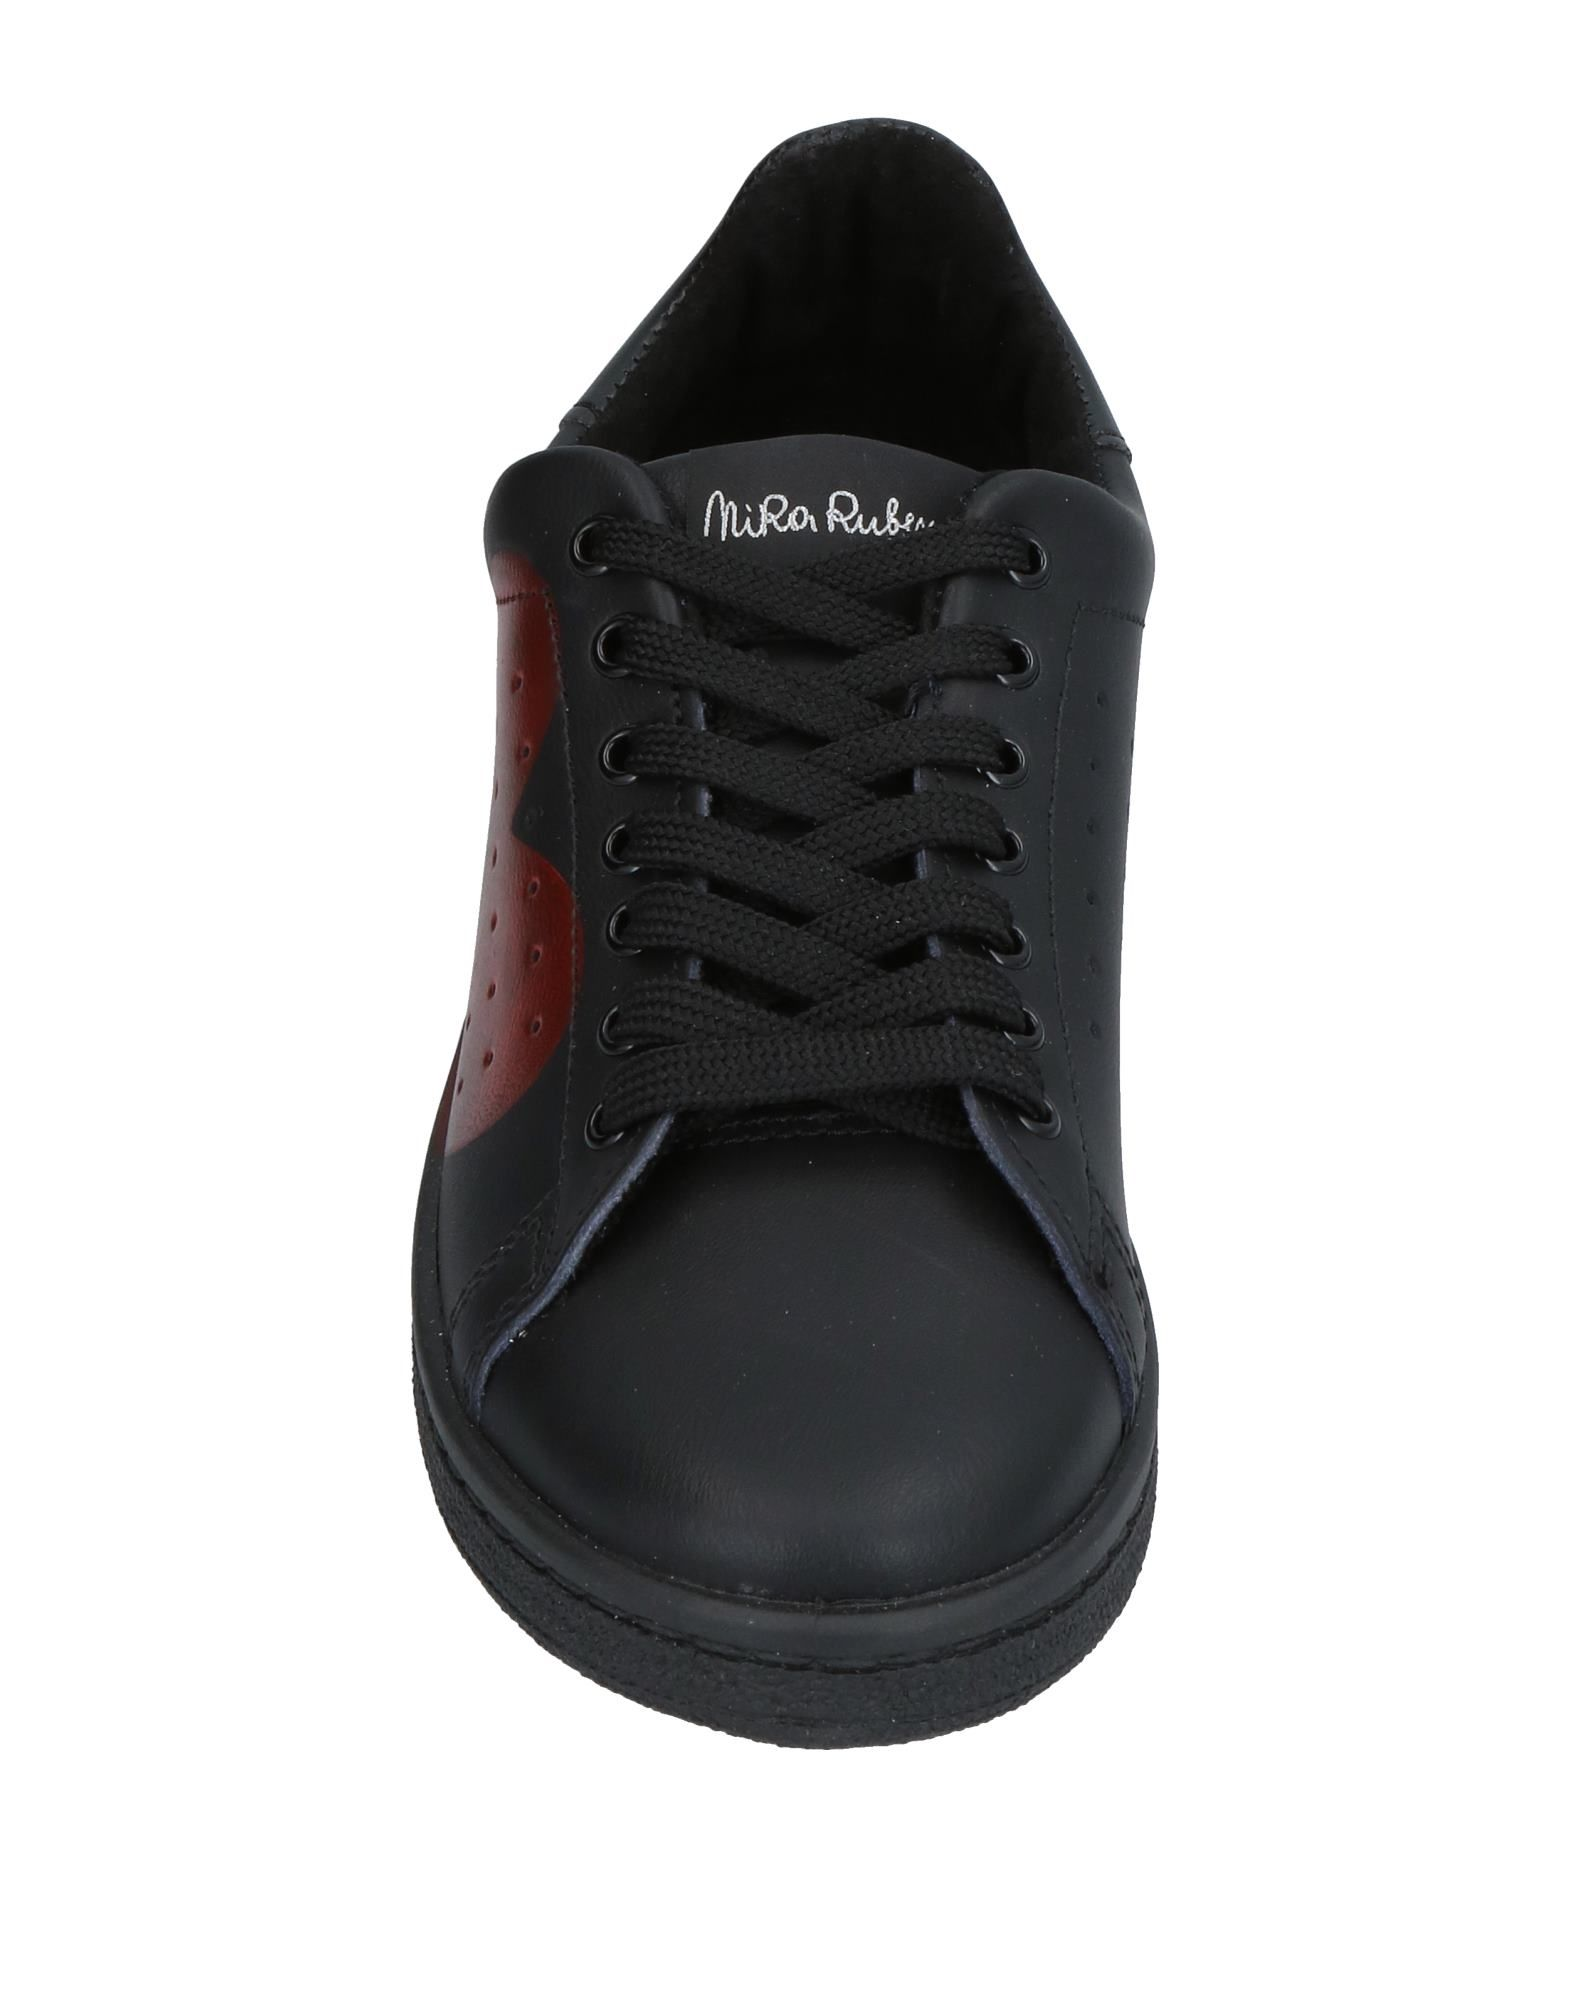 Nira Rubens Rubens Nira Sneakers Damen  11370422LM Gute Qualität beliebte Schuhe cf0072